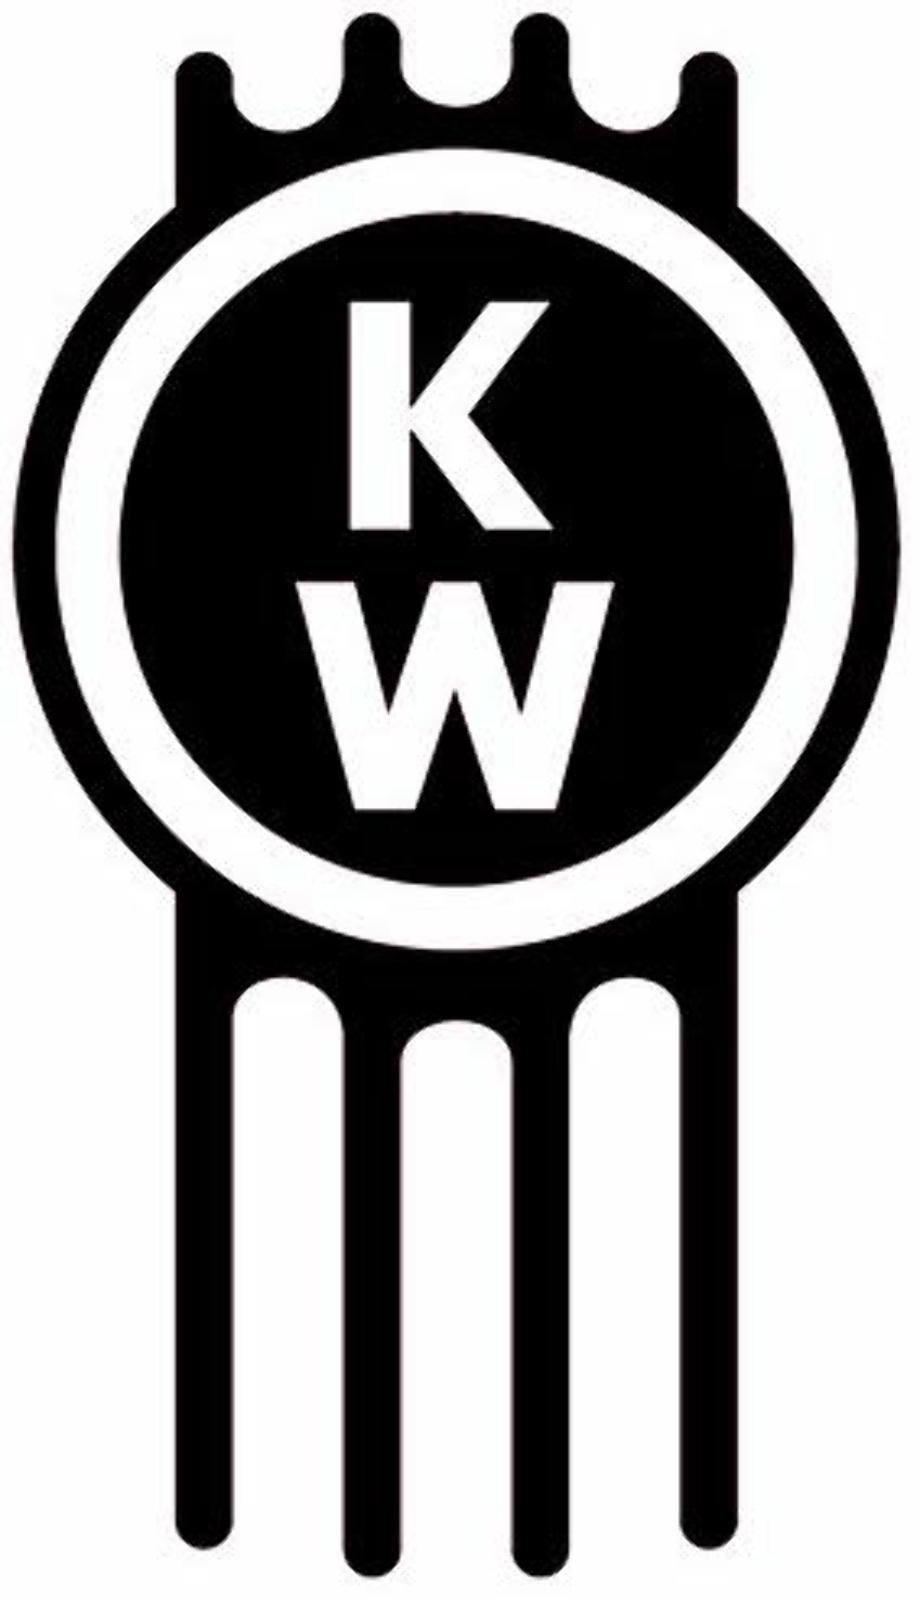 Kenworth logo decal